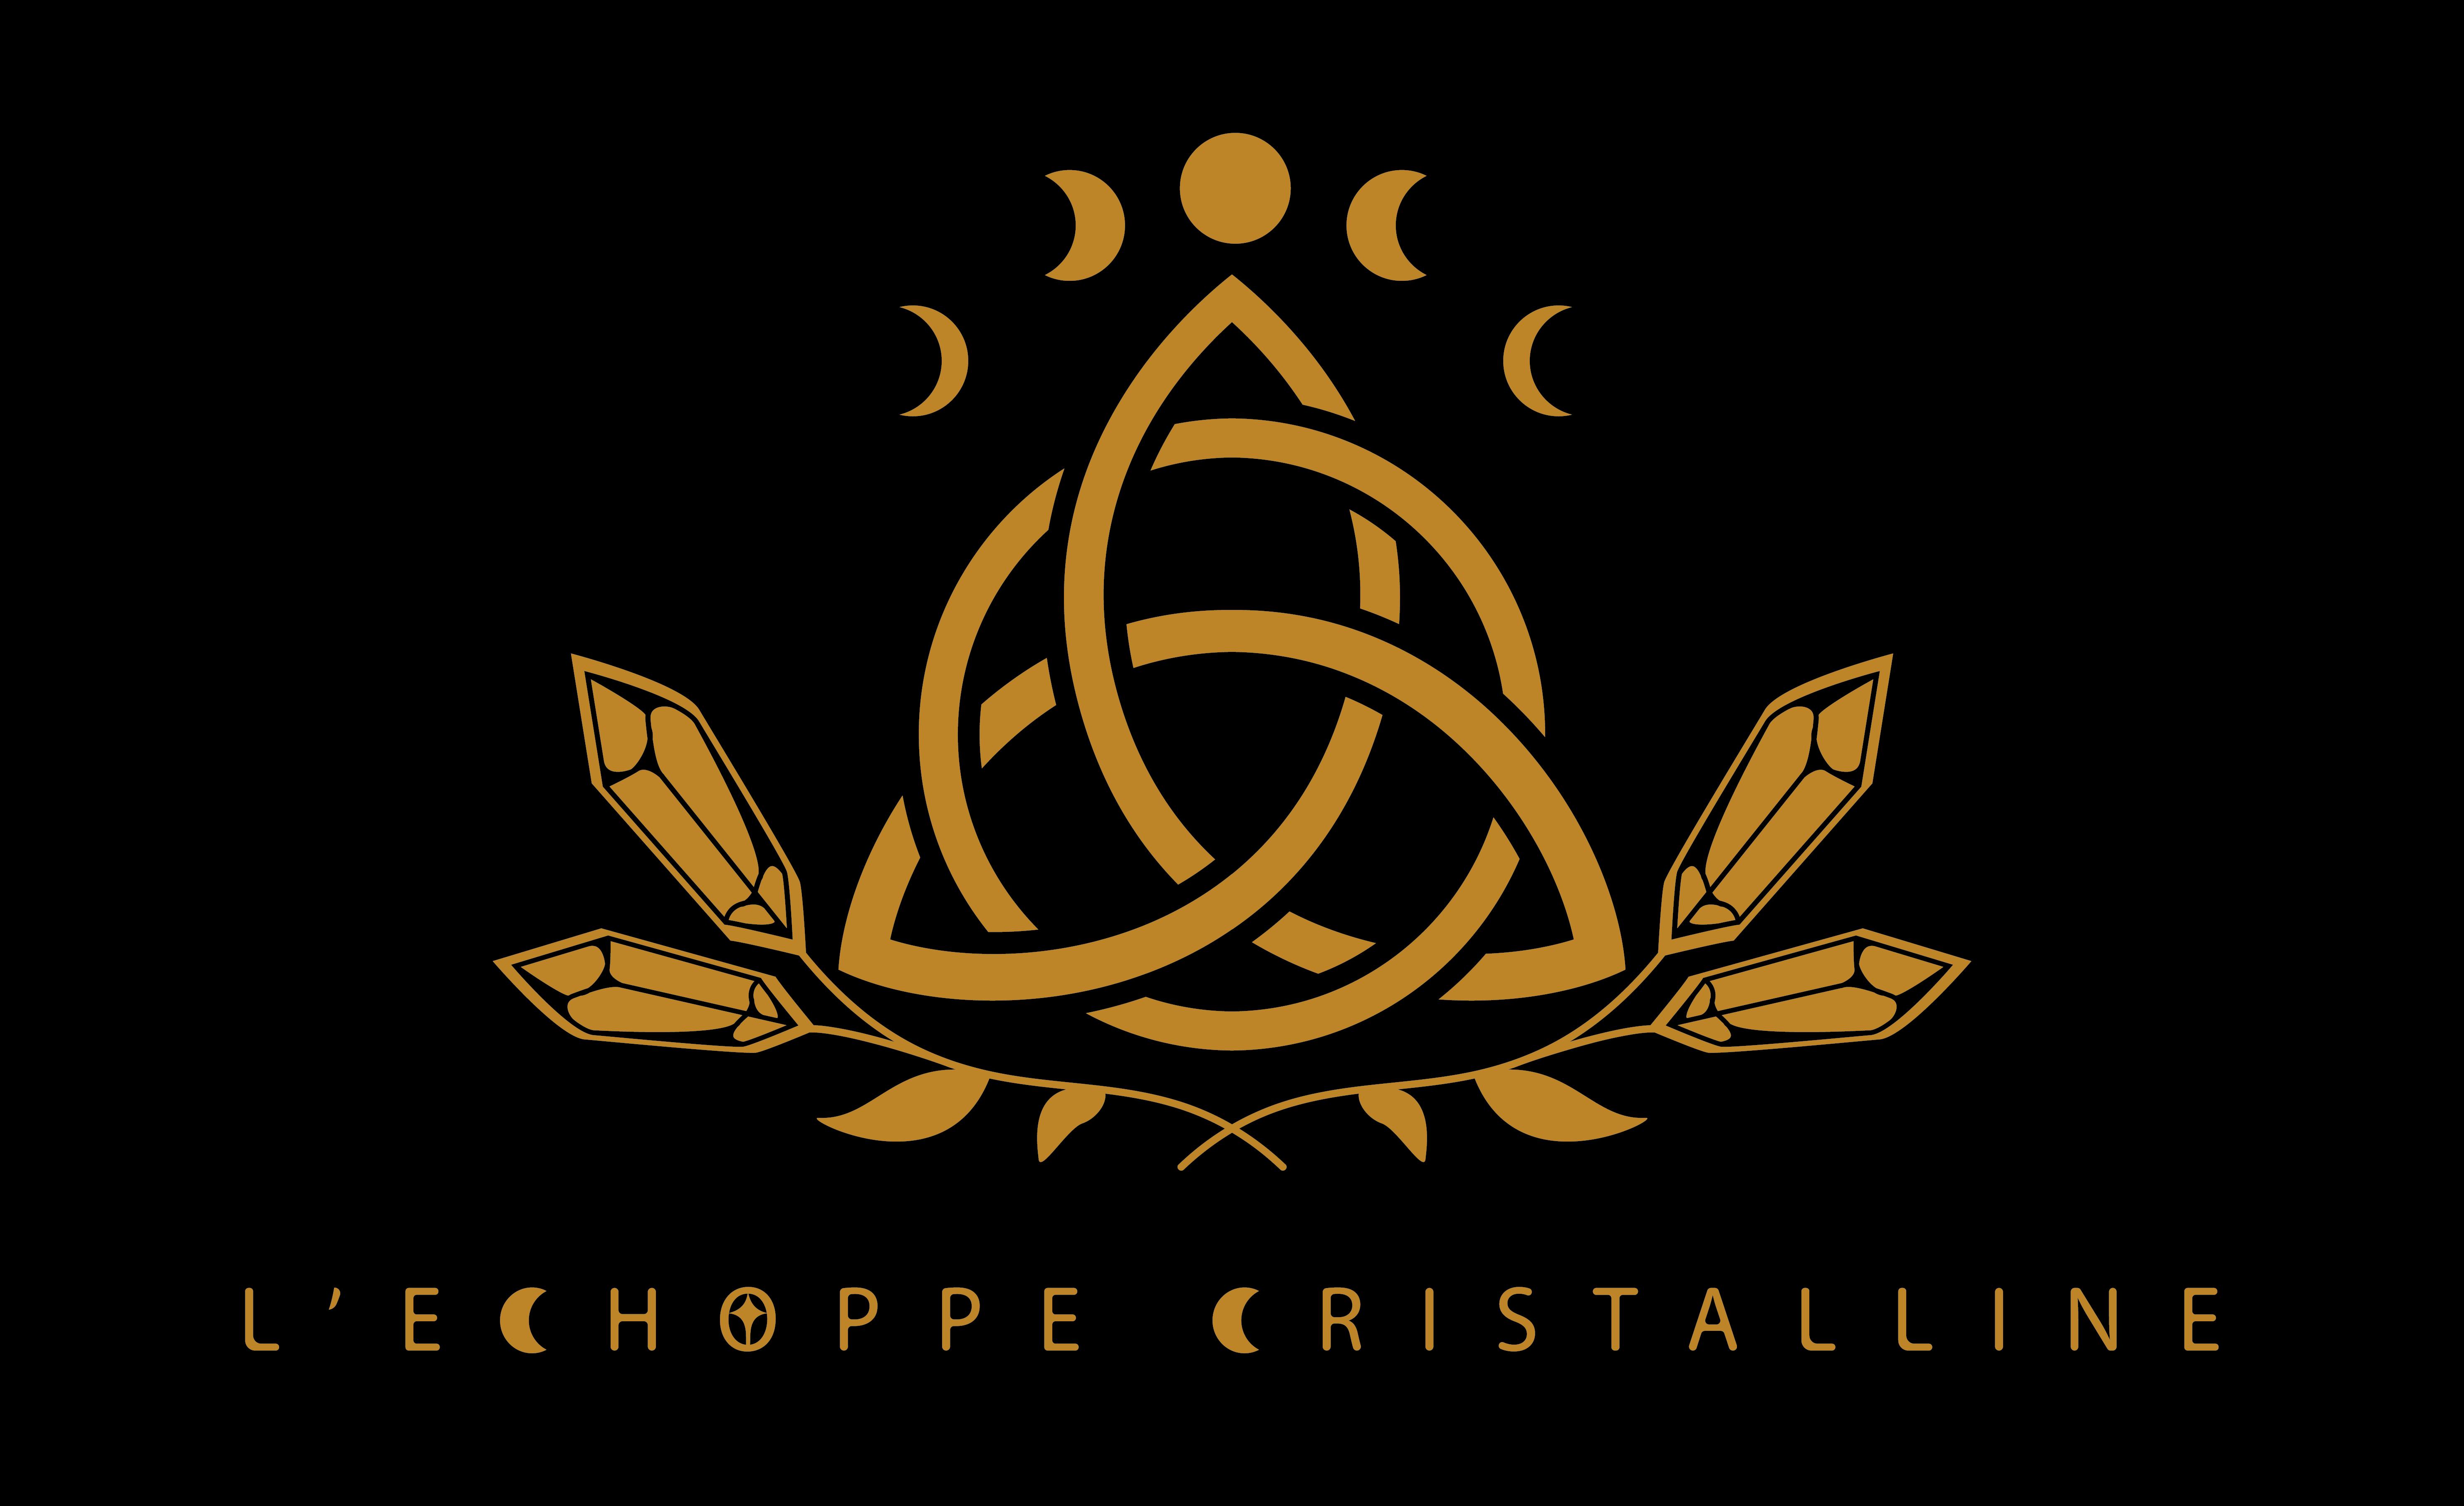 L'ECHOPPE CRISTALLINE